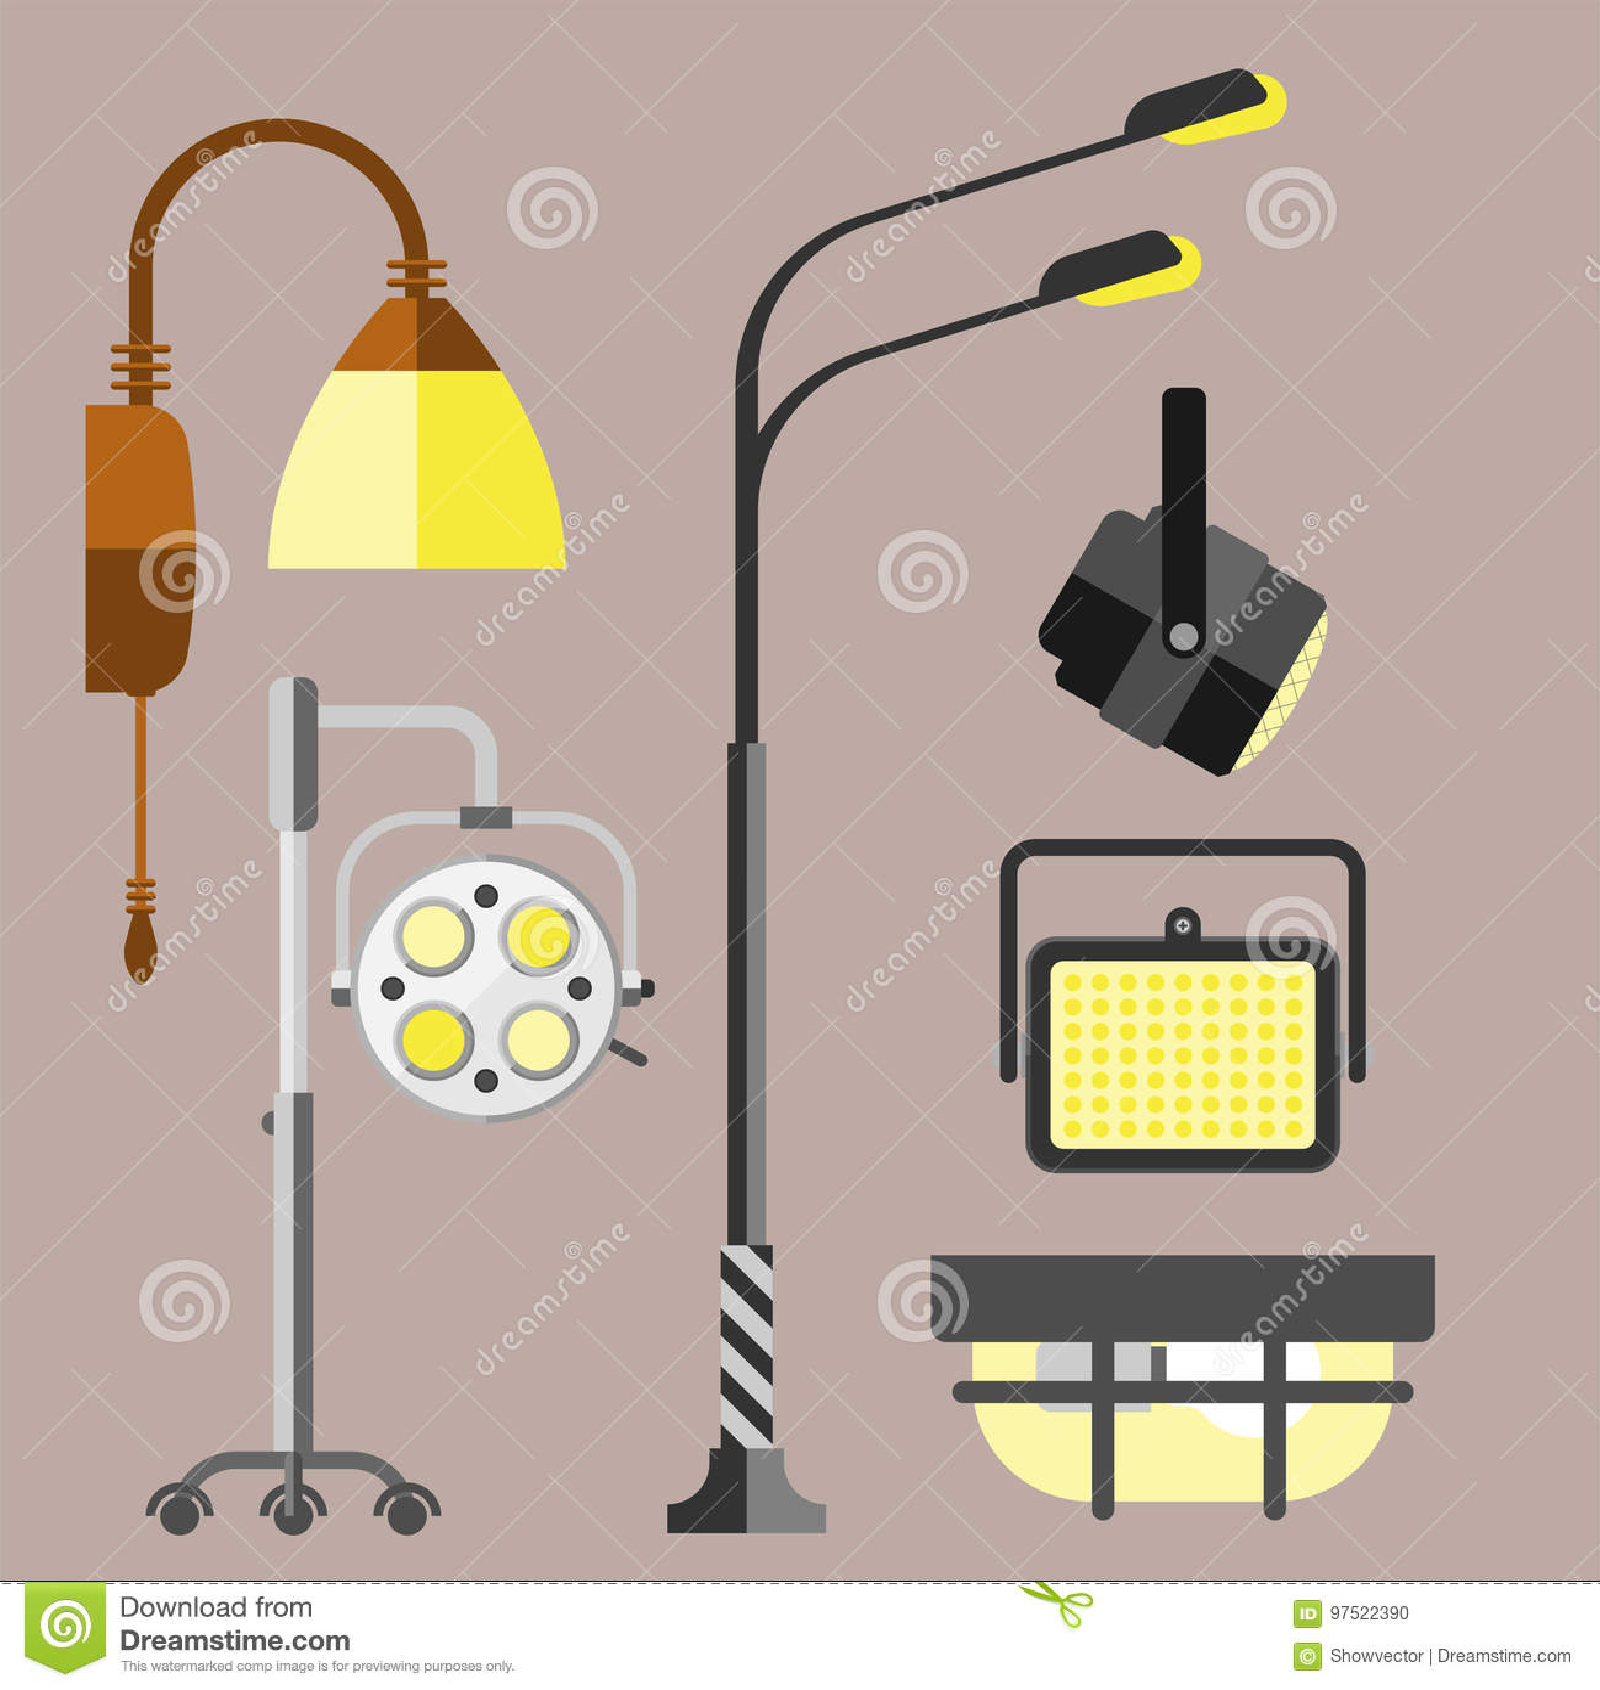 Charmant Electricity Fitting Bilder - Schaltplan Serie Circuit ...